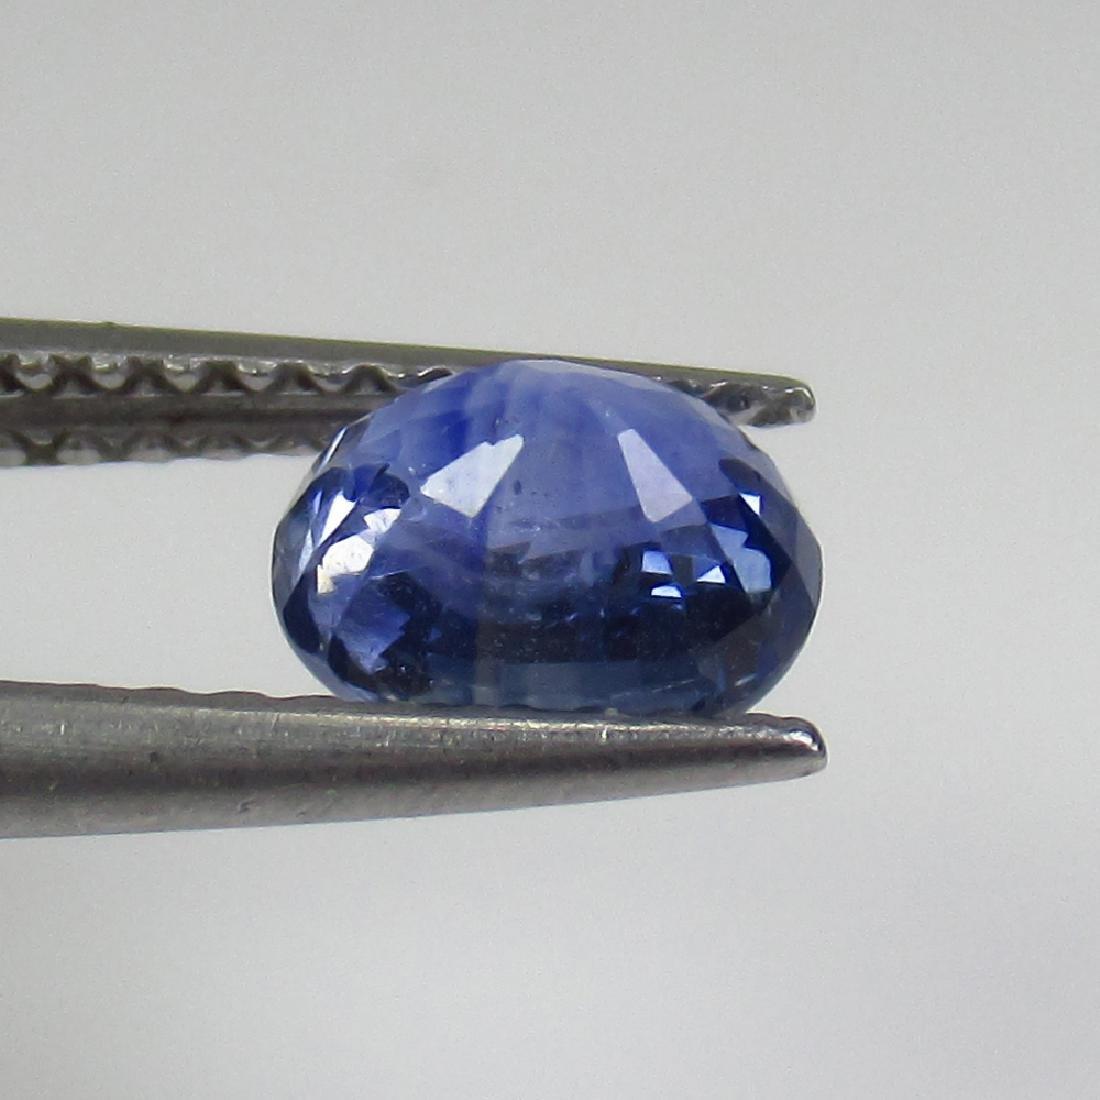 1.11 Ct Genuine Ceylon Blue Sapphire Oval Cut - 2